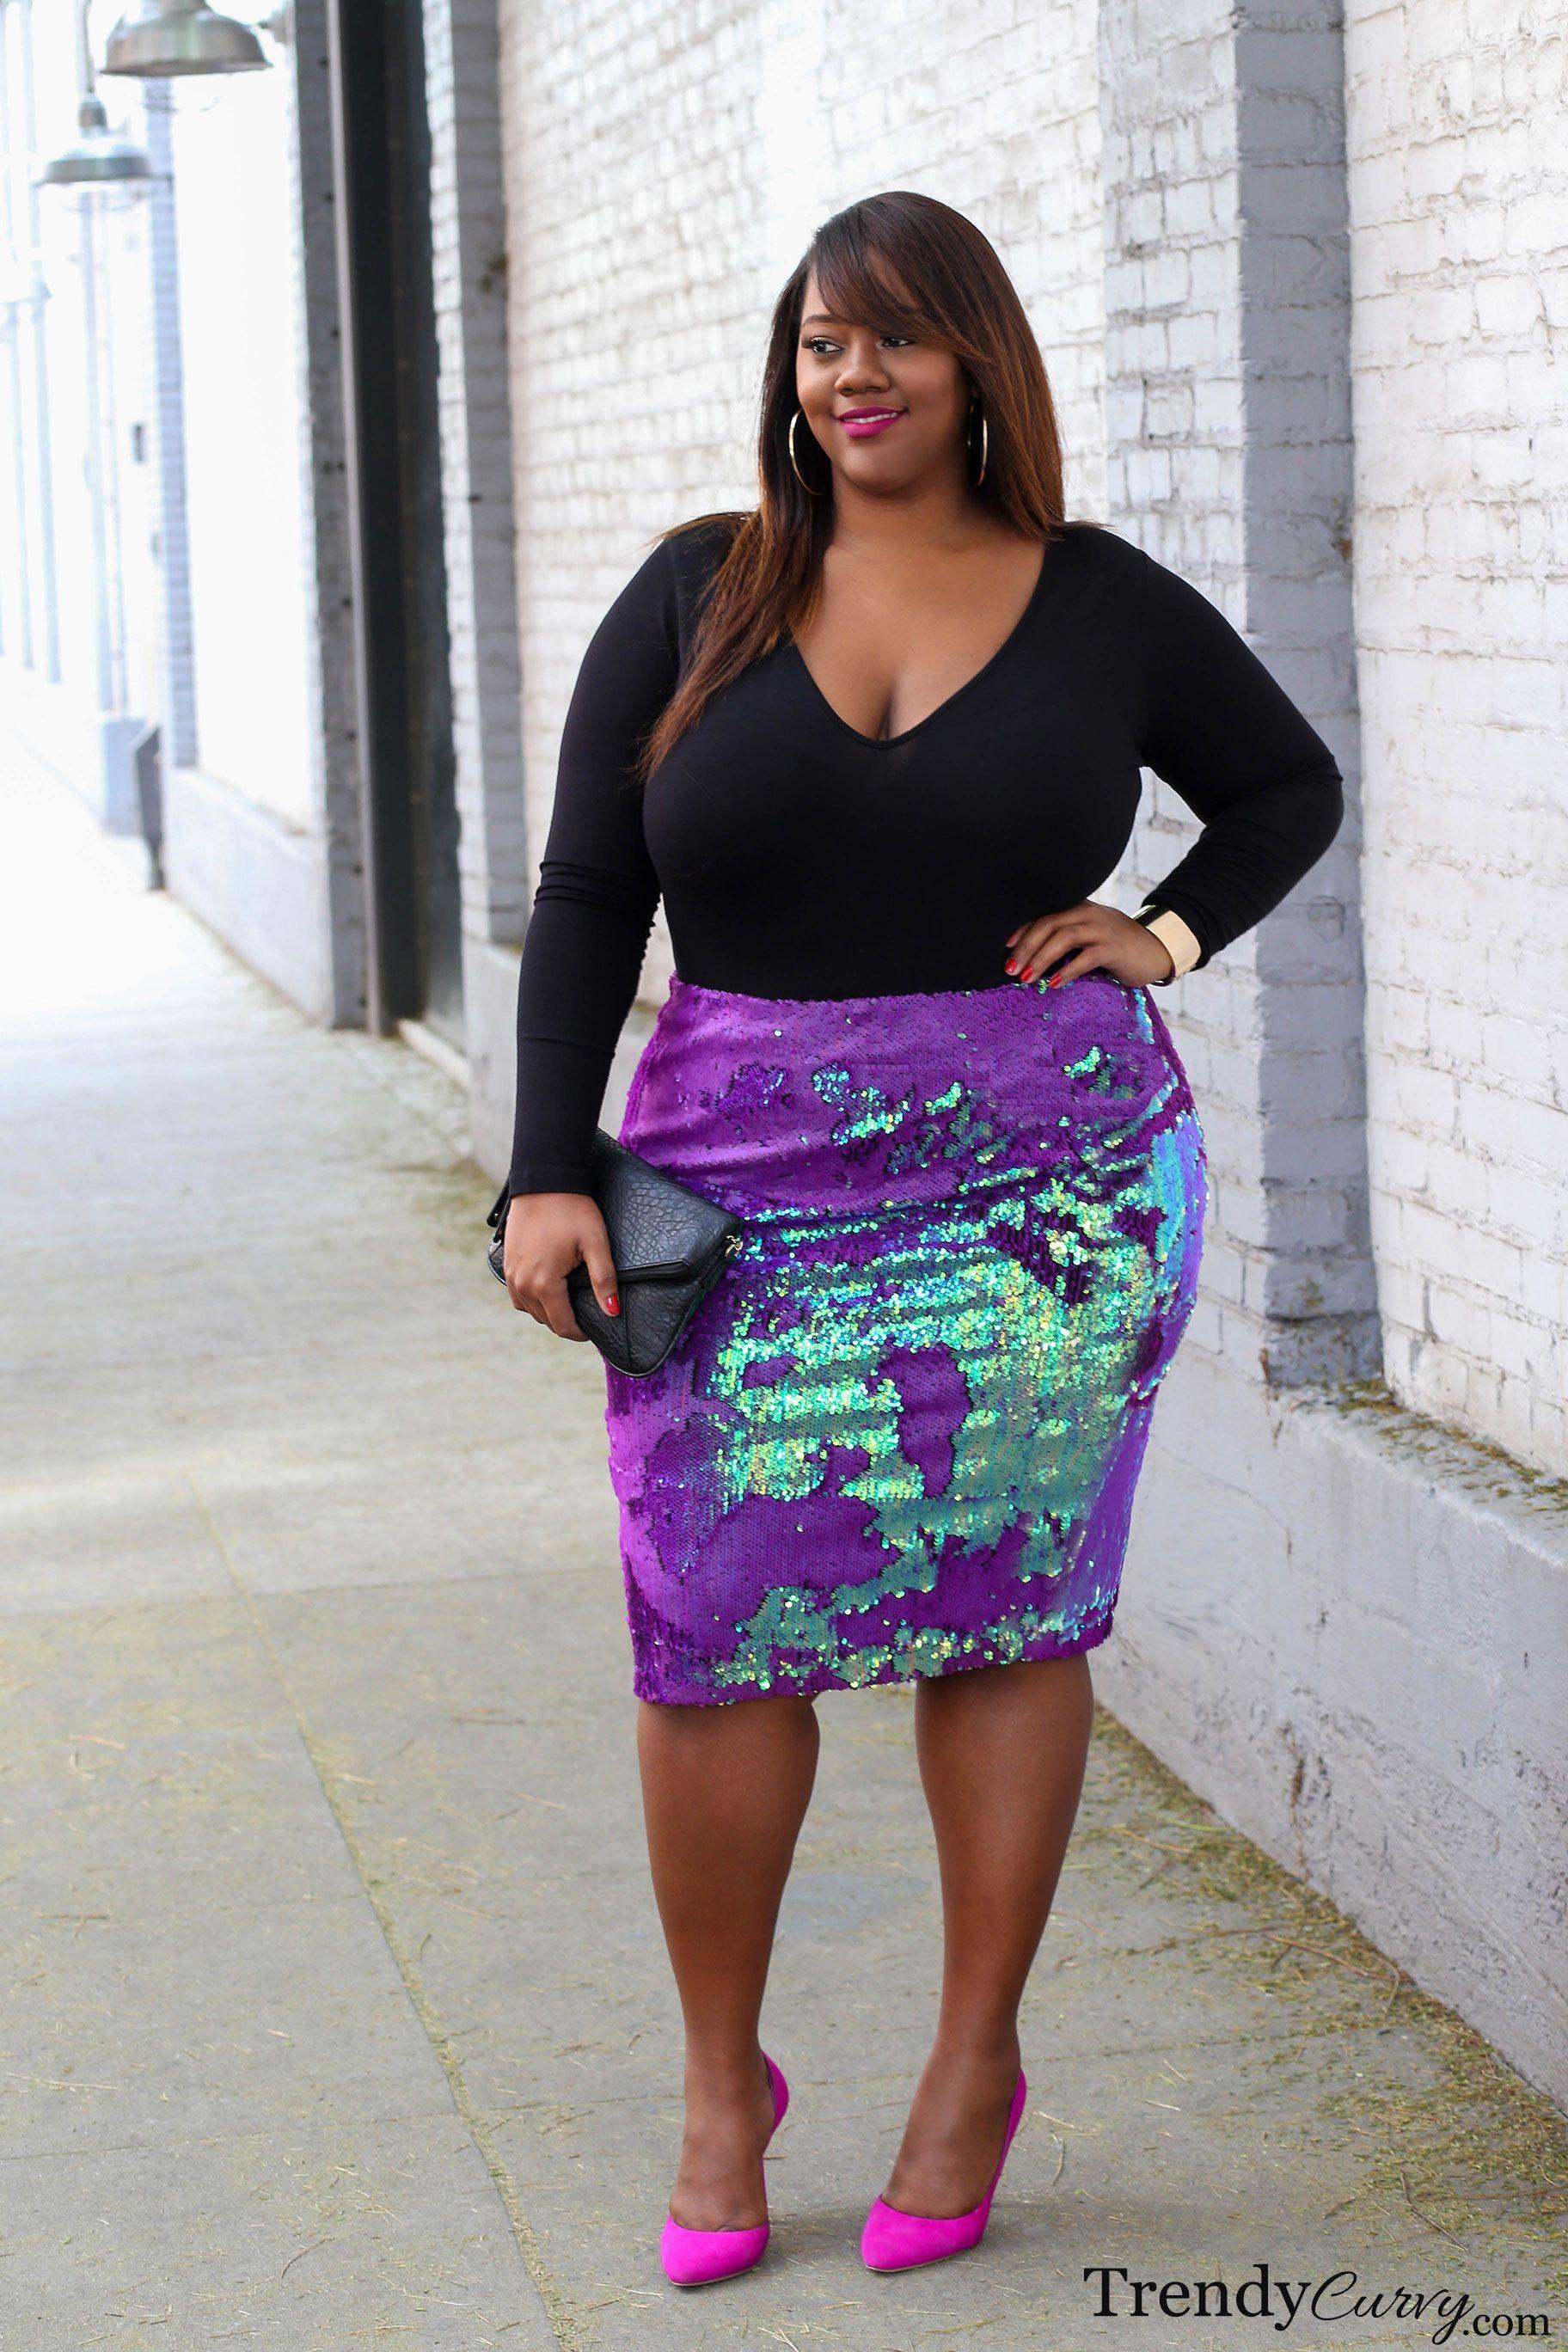 759bc3c2de9 Plus Size Holiday Fashion